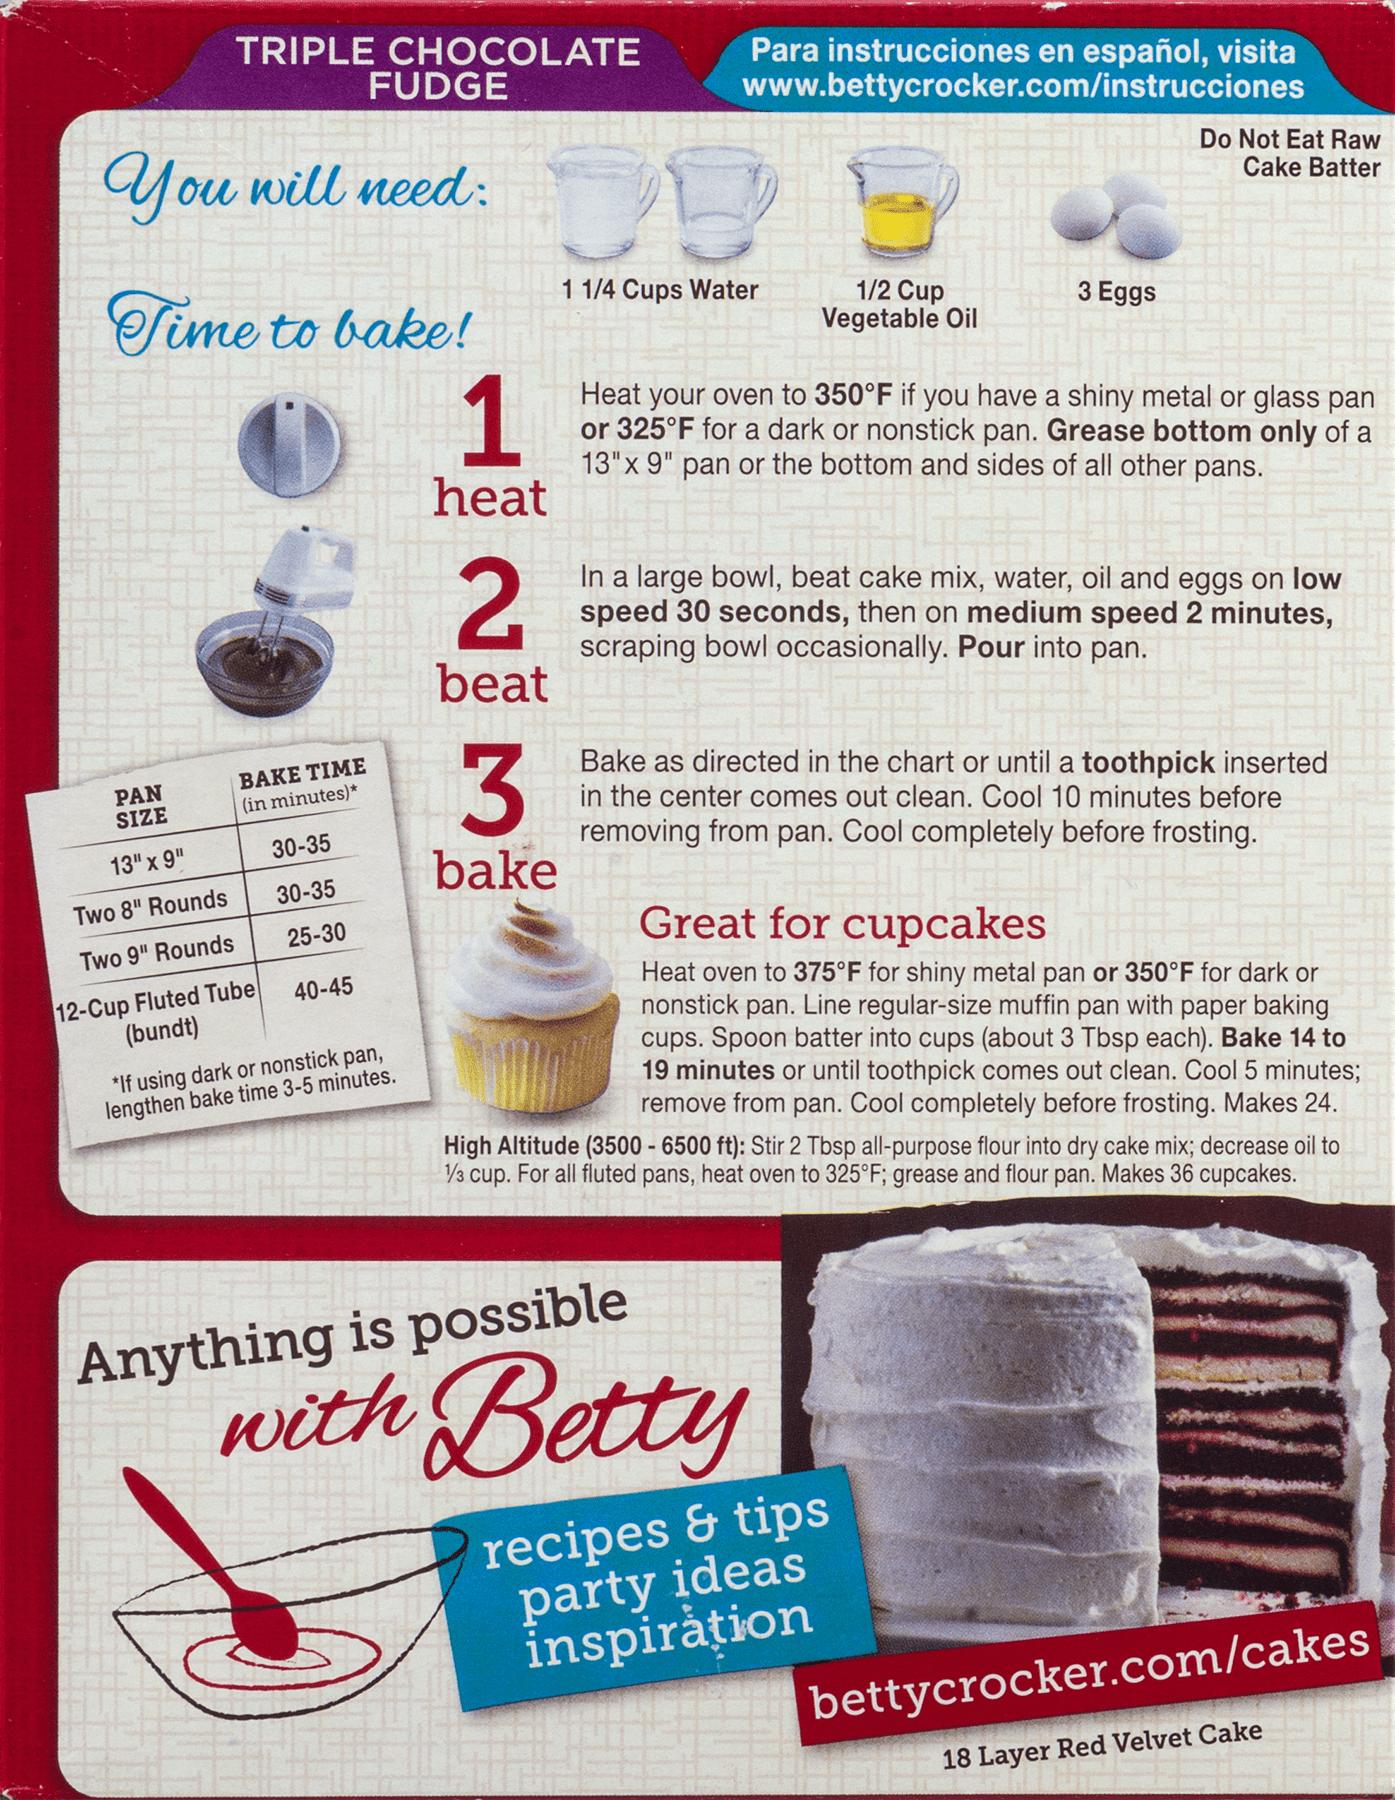 Betty Crocker Chocolate Cake Mix Instructions